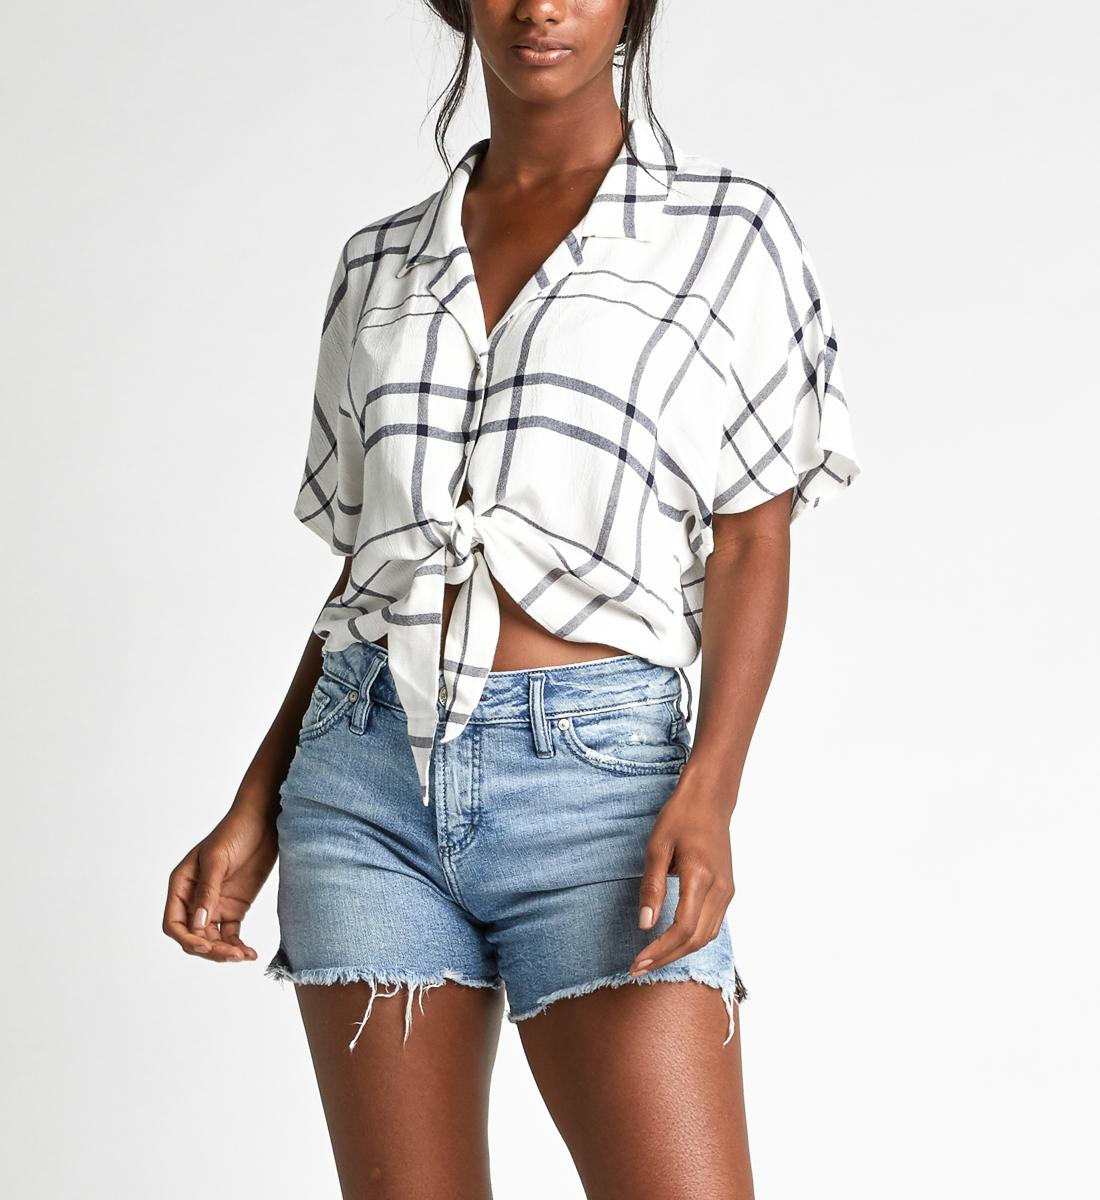 72dfc288f Sunny Cropped Dolman Tie-Waist Plaid Shirt - Silver Jeans US